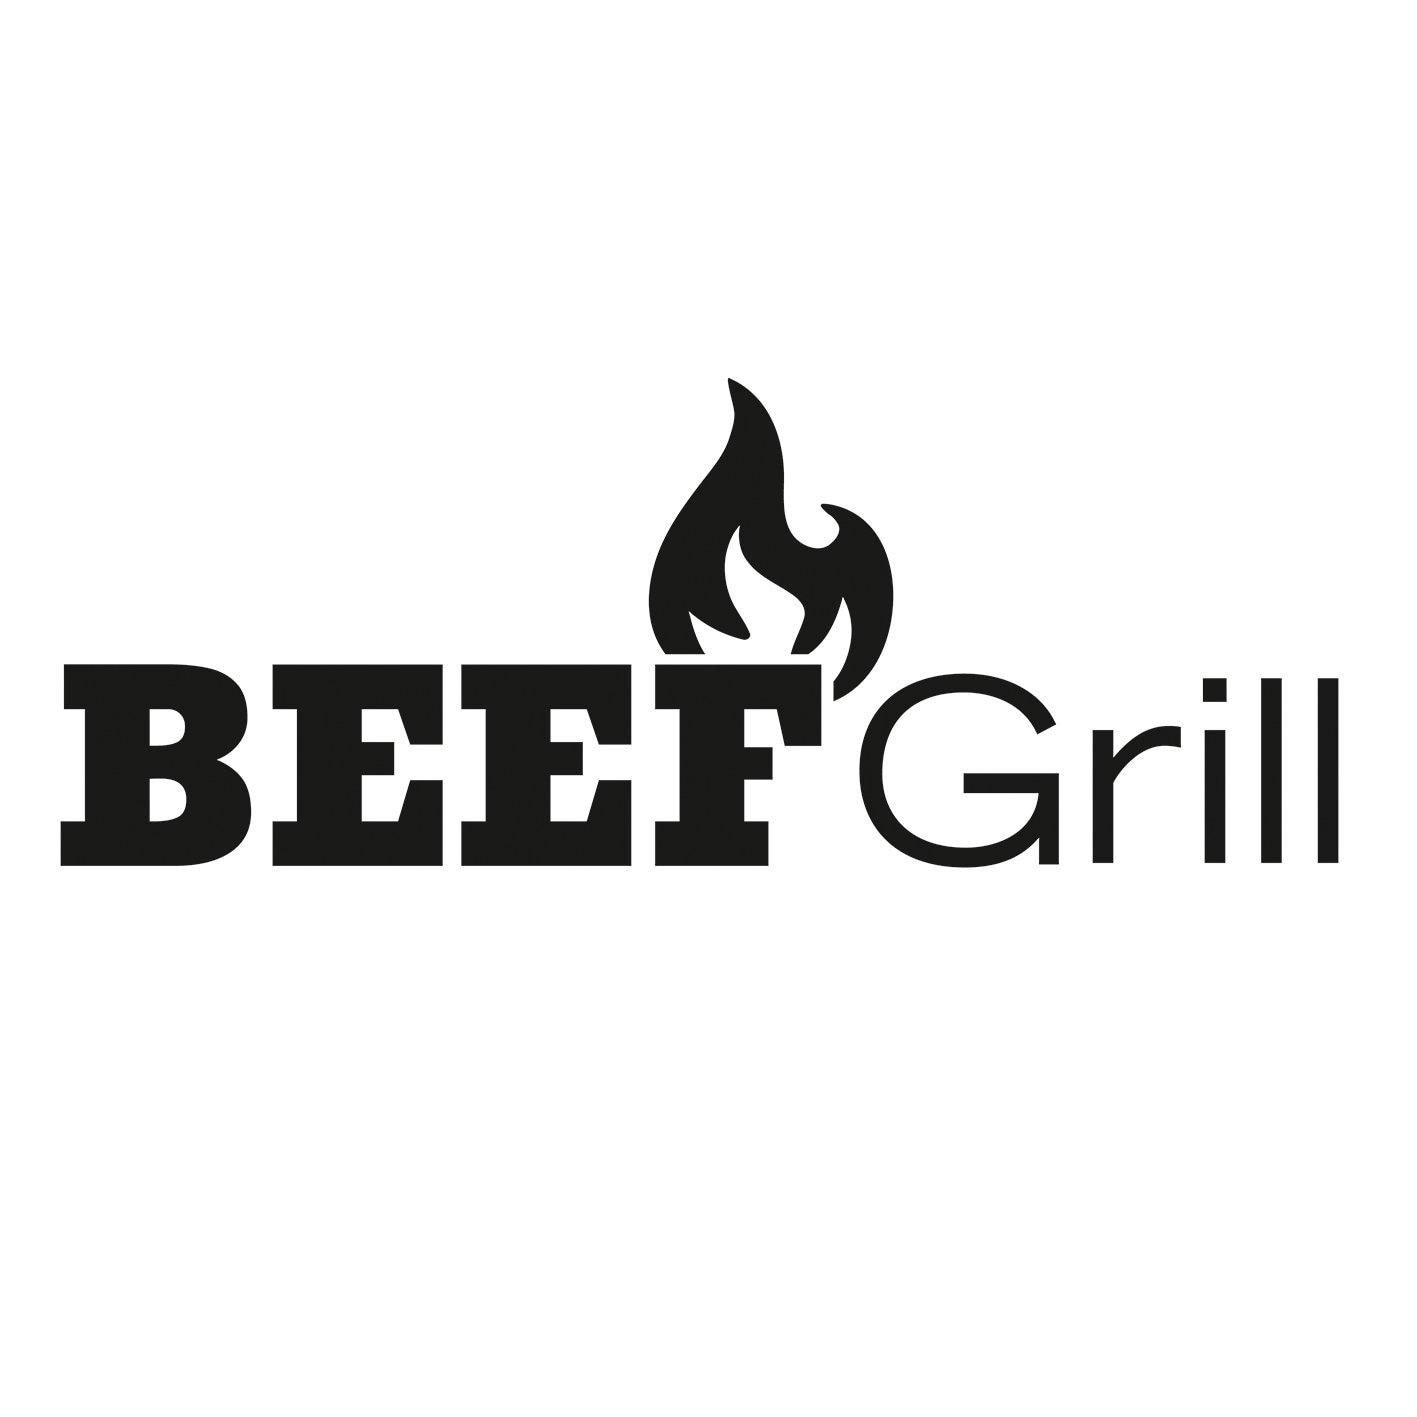 GOURMETmaxx Beef Grill Oberhitze Gasgrill aus Edelstahl für Temperaturen bis zu 800° C